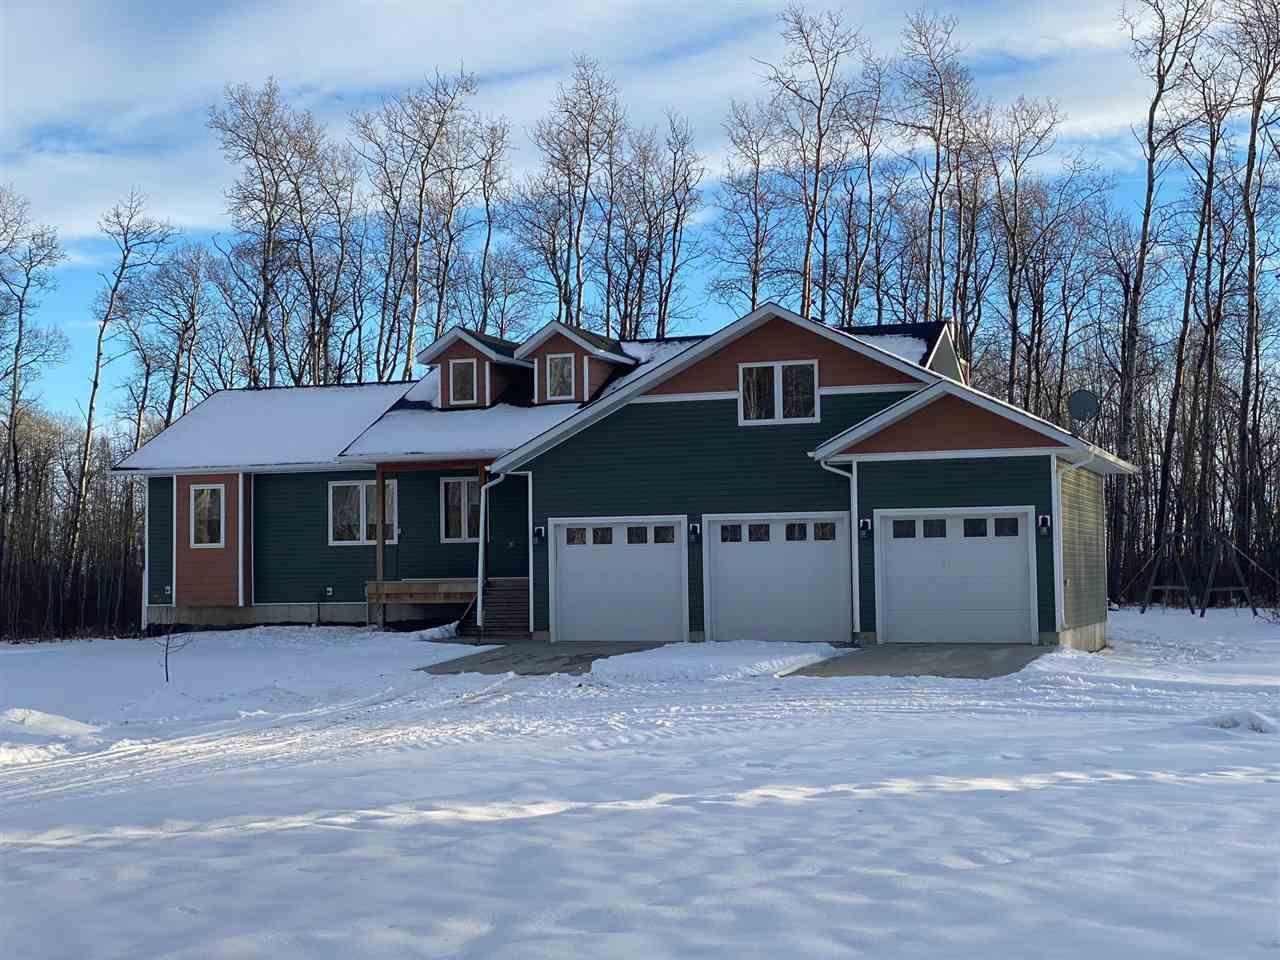 Main Photo: 471052 RGE RD 250 R.R. 1: Rural Wetaskiwin County House for sale : MLS®# E4223049